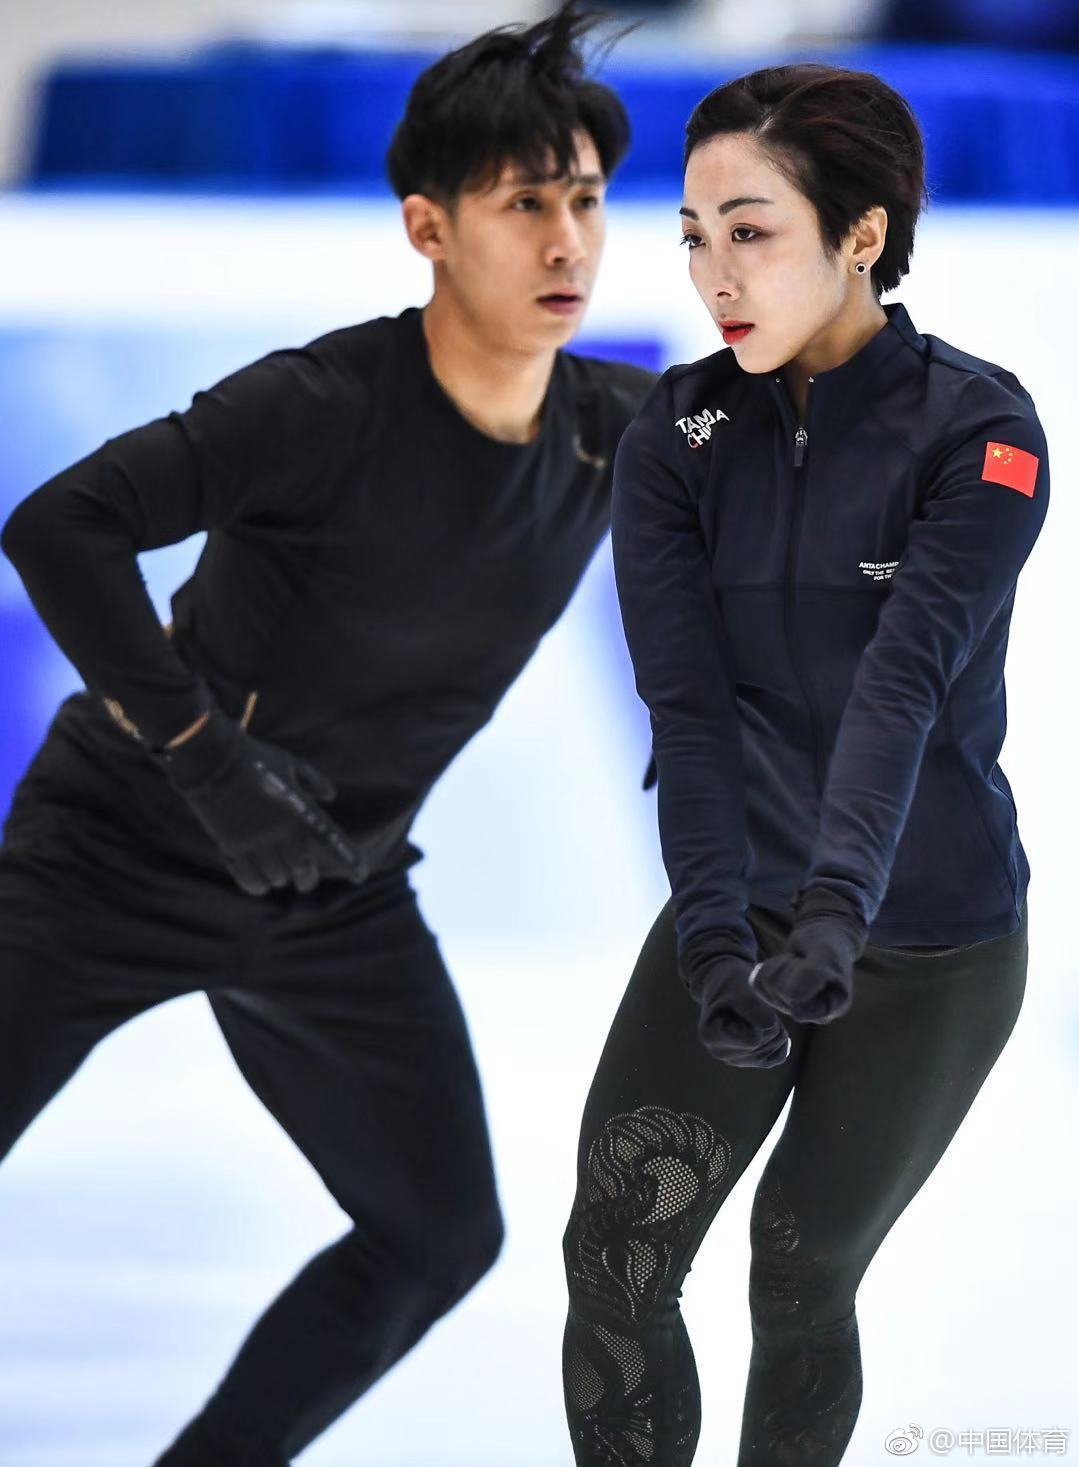 Вэньцзин Суй - Цун Хань / Wenjing SUI - Cong HAN CHN - Страница 14 3h8du